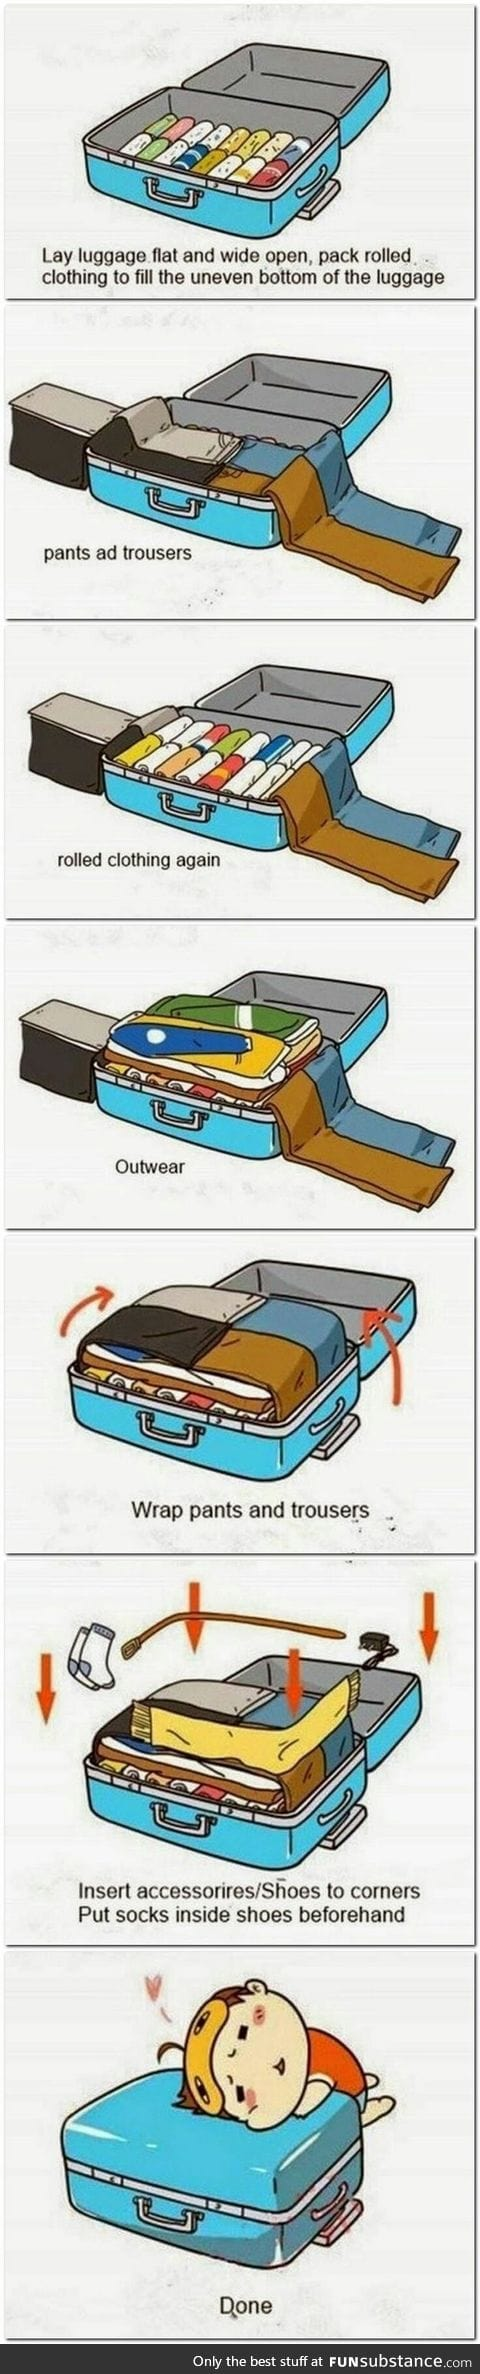 Supreme luggage/suitcase packing